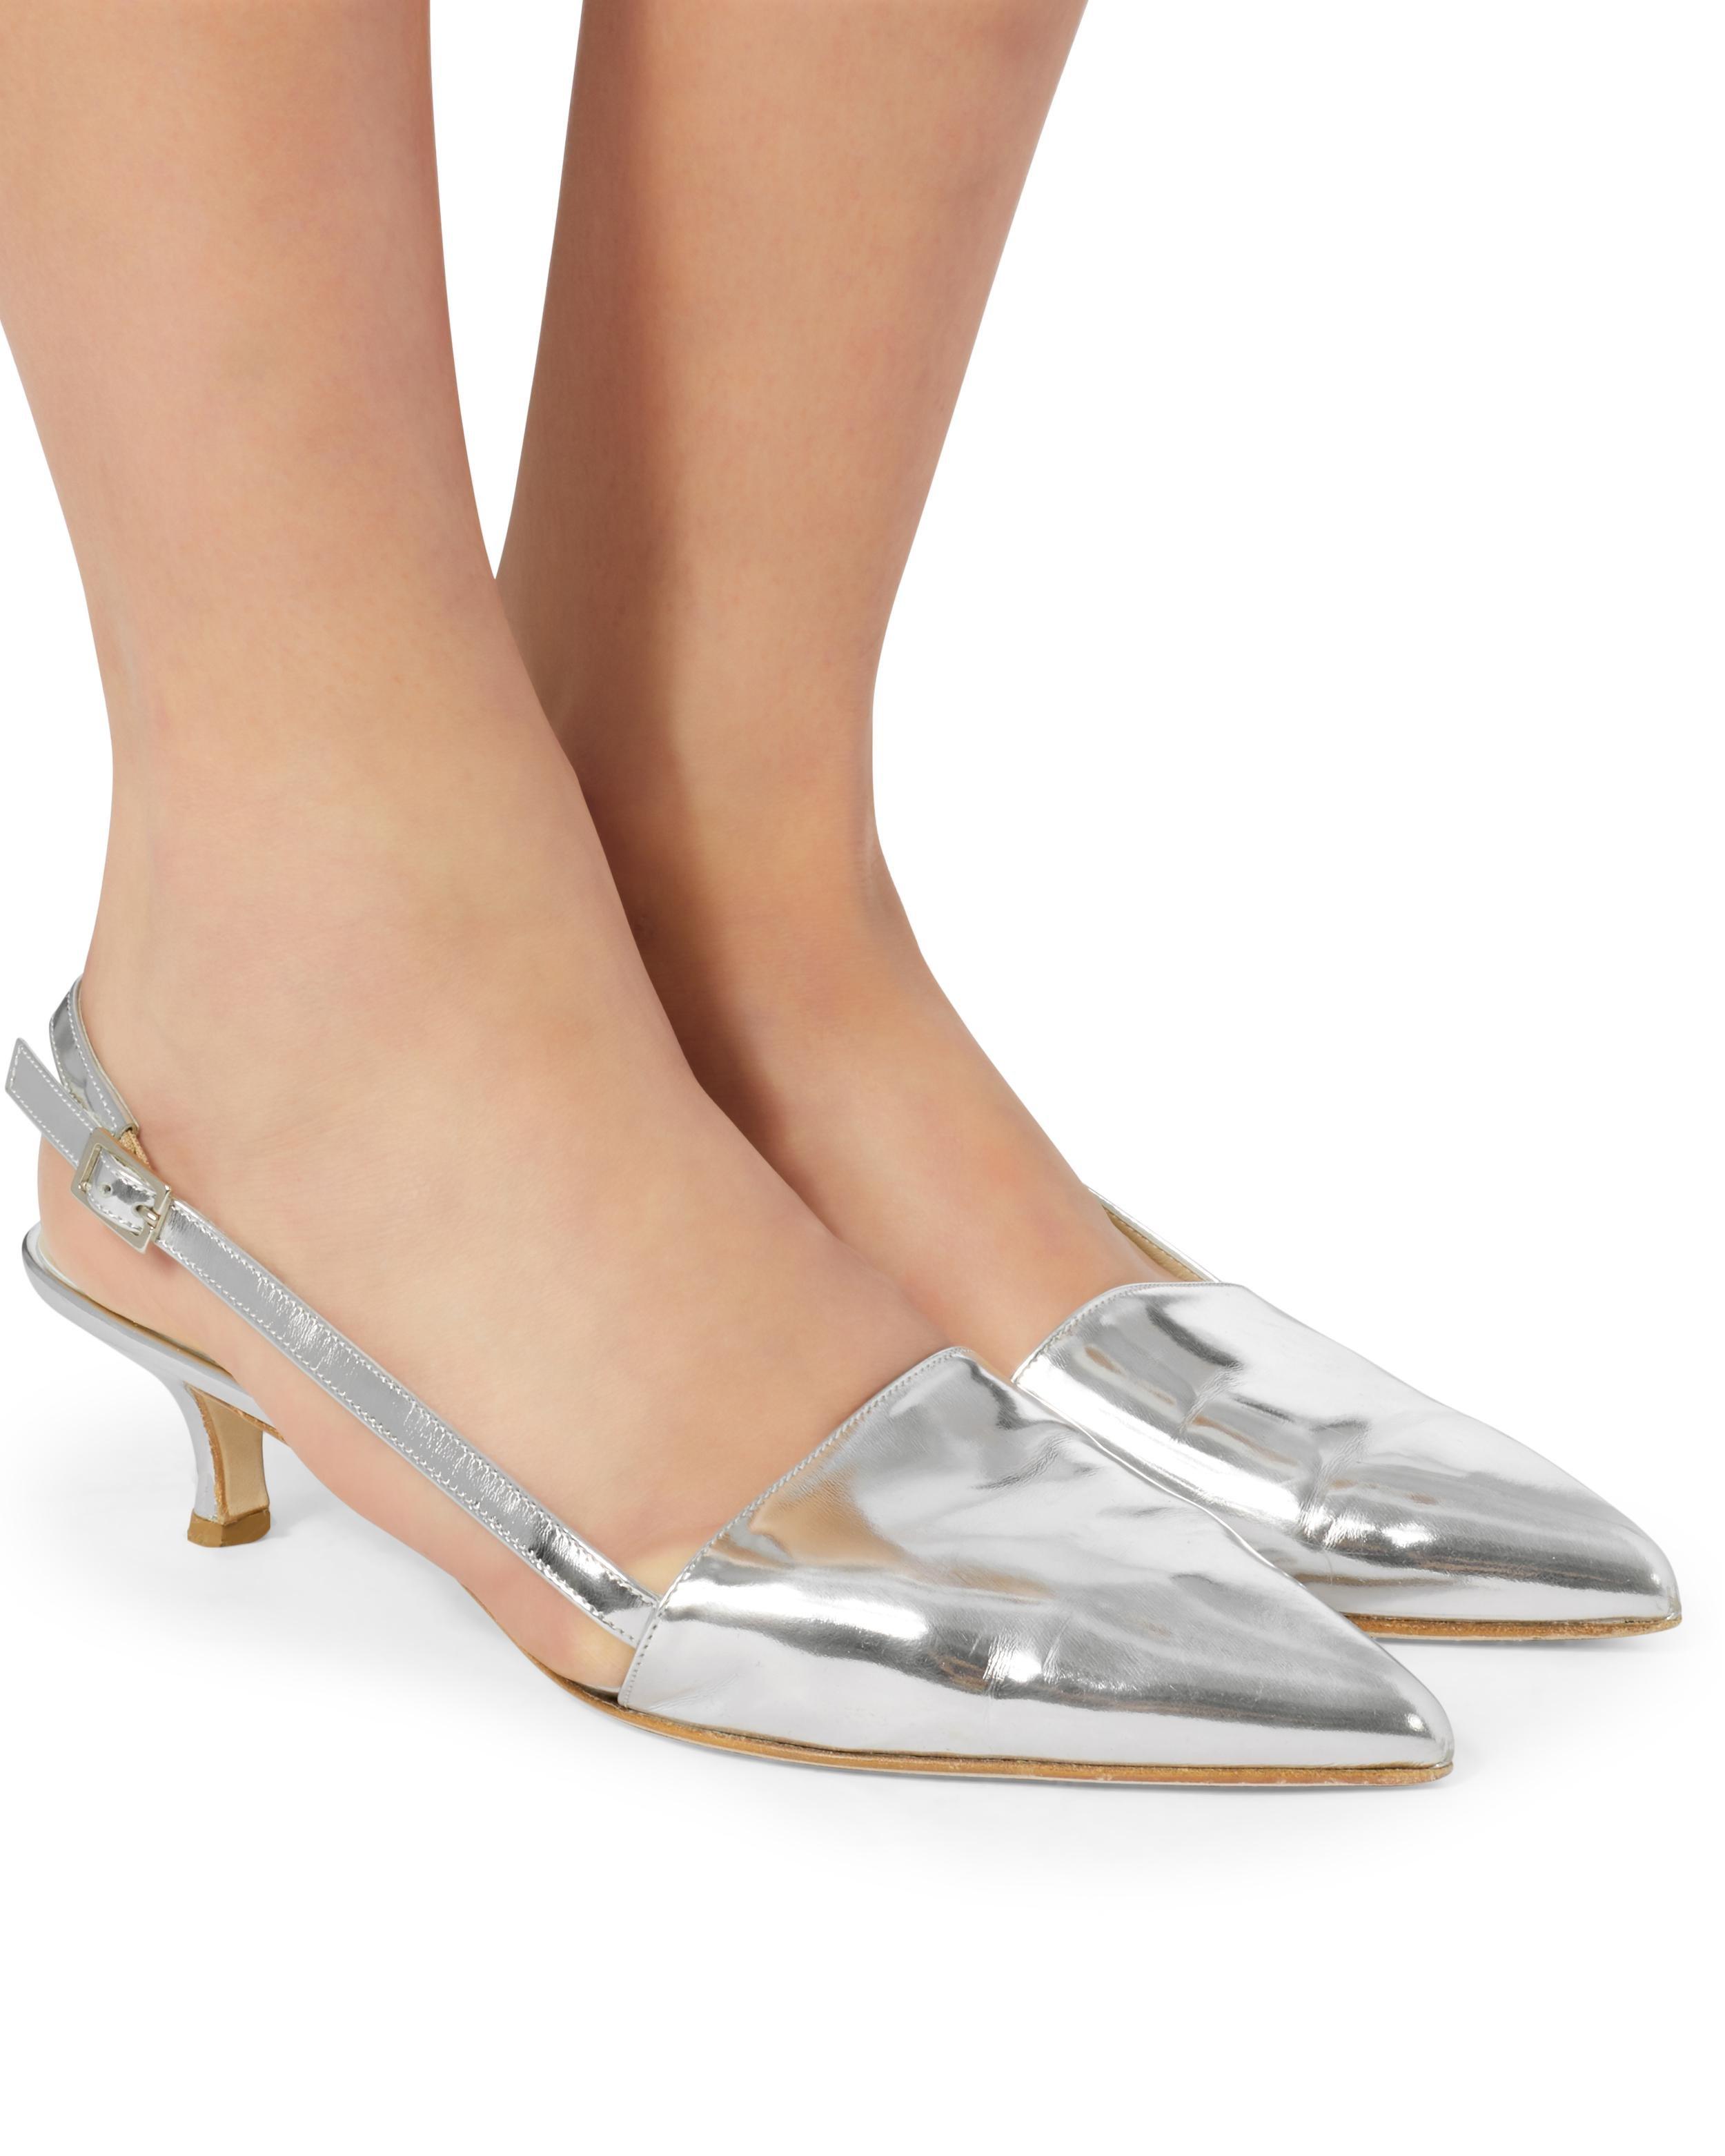 fb7a2961571 Lyst - Tibi Simon Slingback Kitten Heels in Metallic